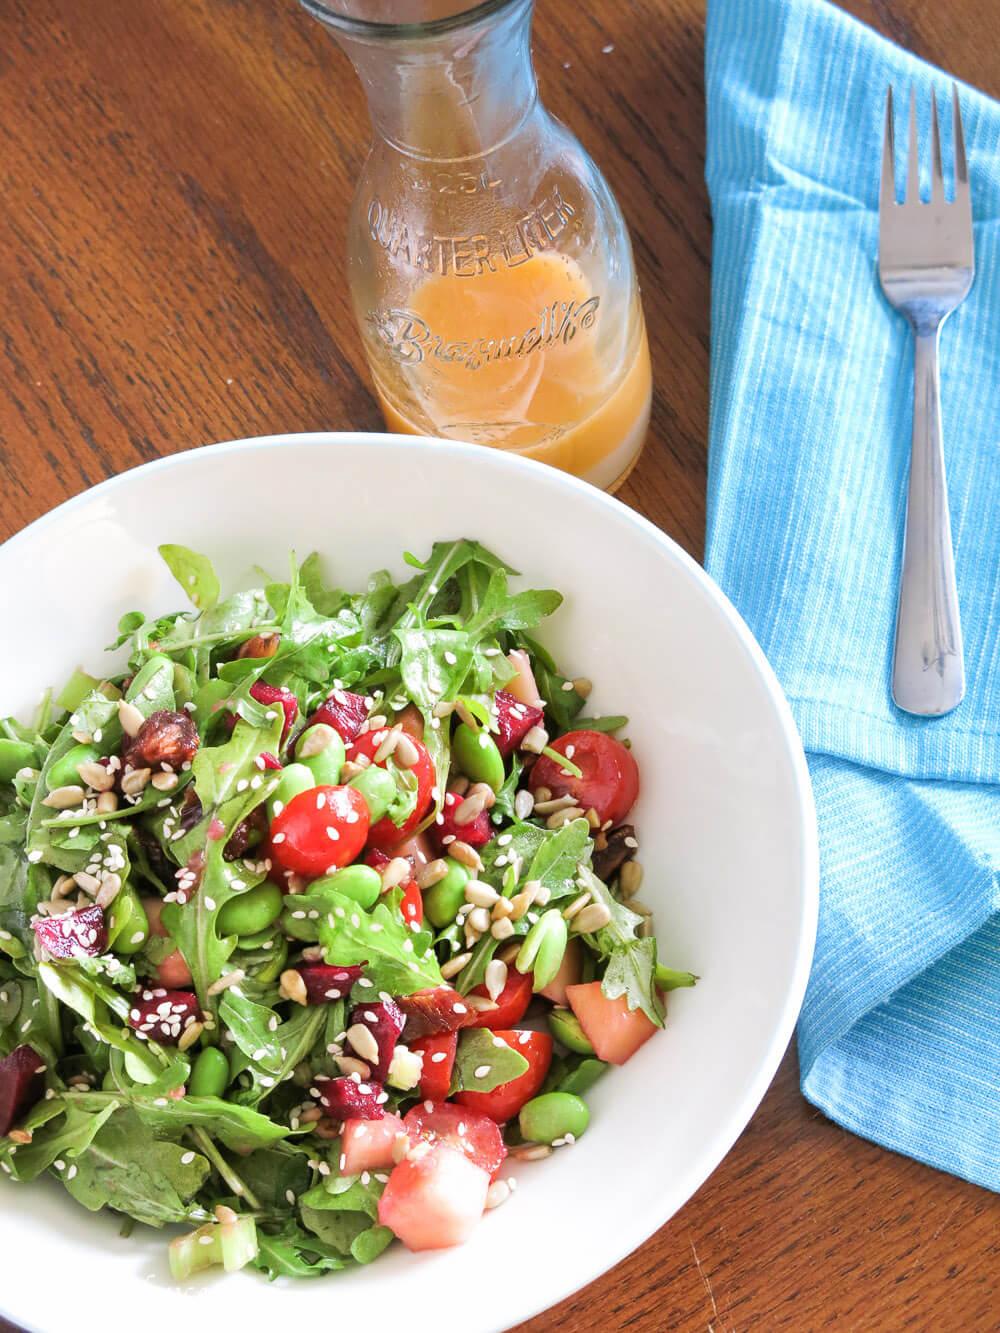 arugula, edamame, beet and date salad with jar of grapefruit viniagrette